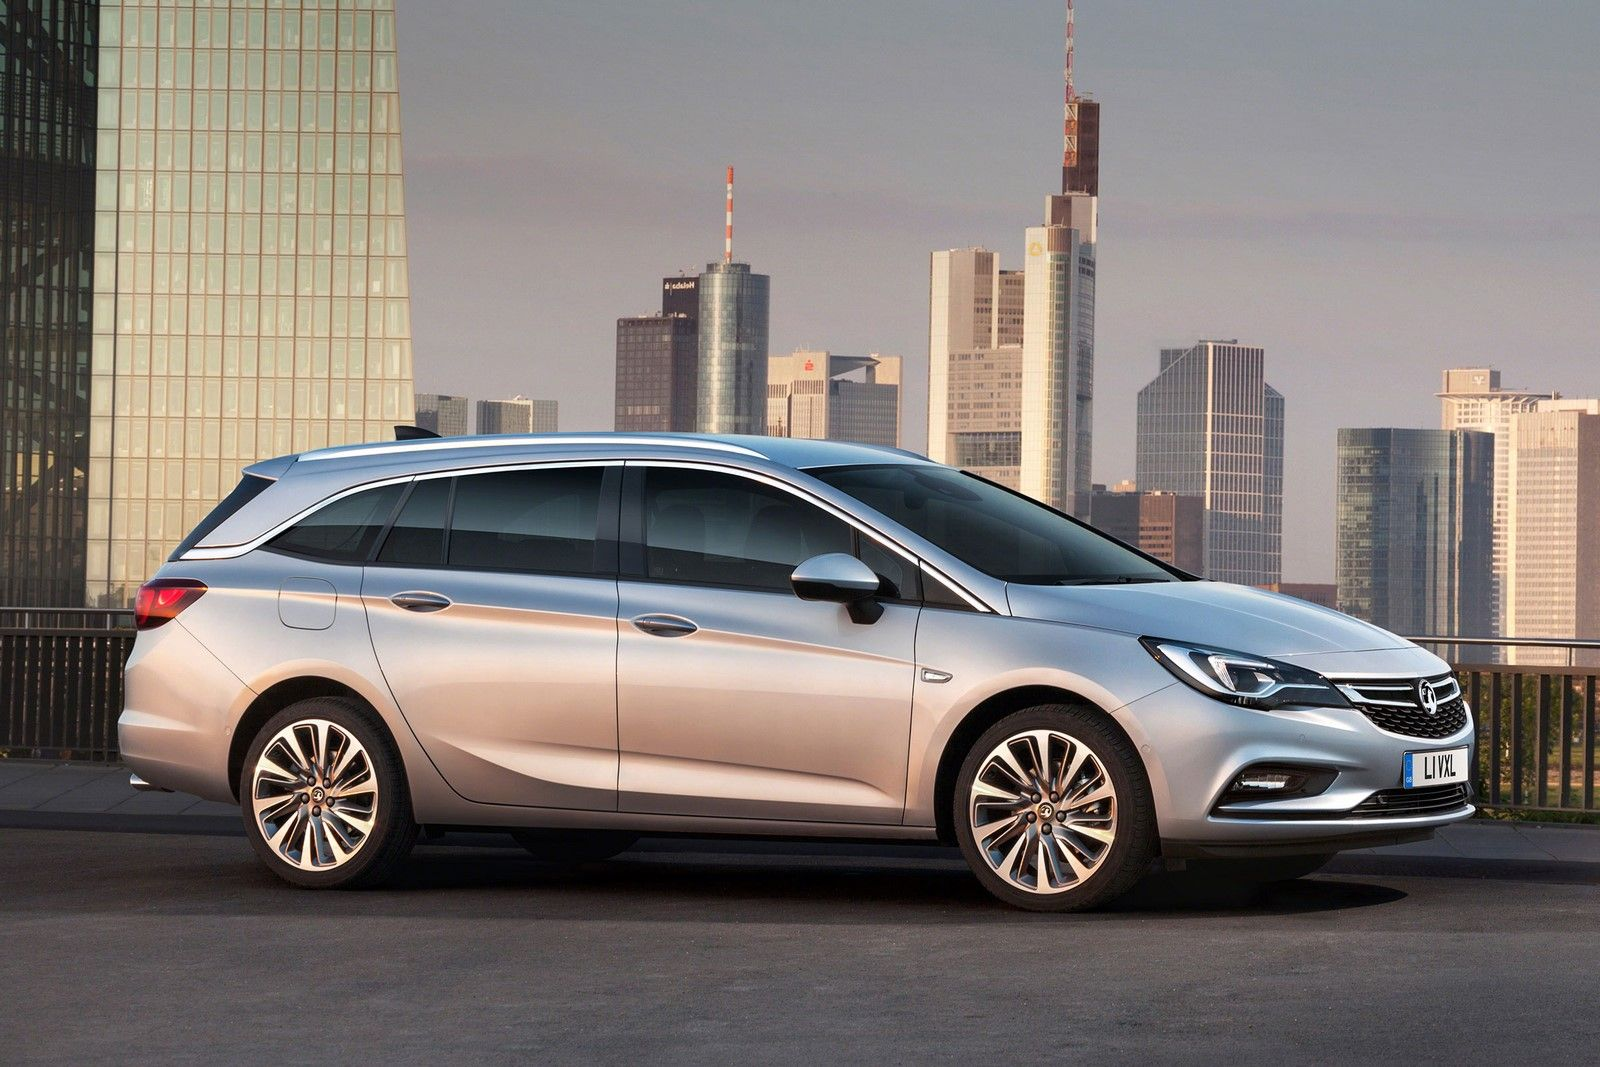 2016 Opel Vauxhall Astra Sports Tourer Revealed 22 Images Vauxhall Astra Opel Vauxhall